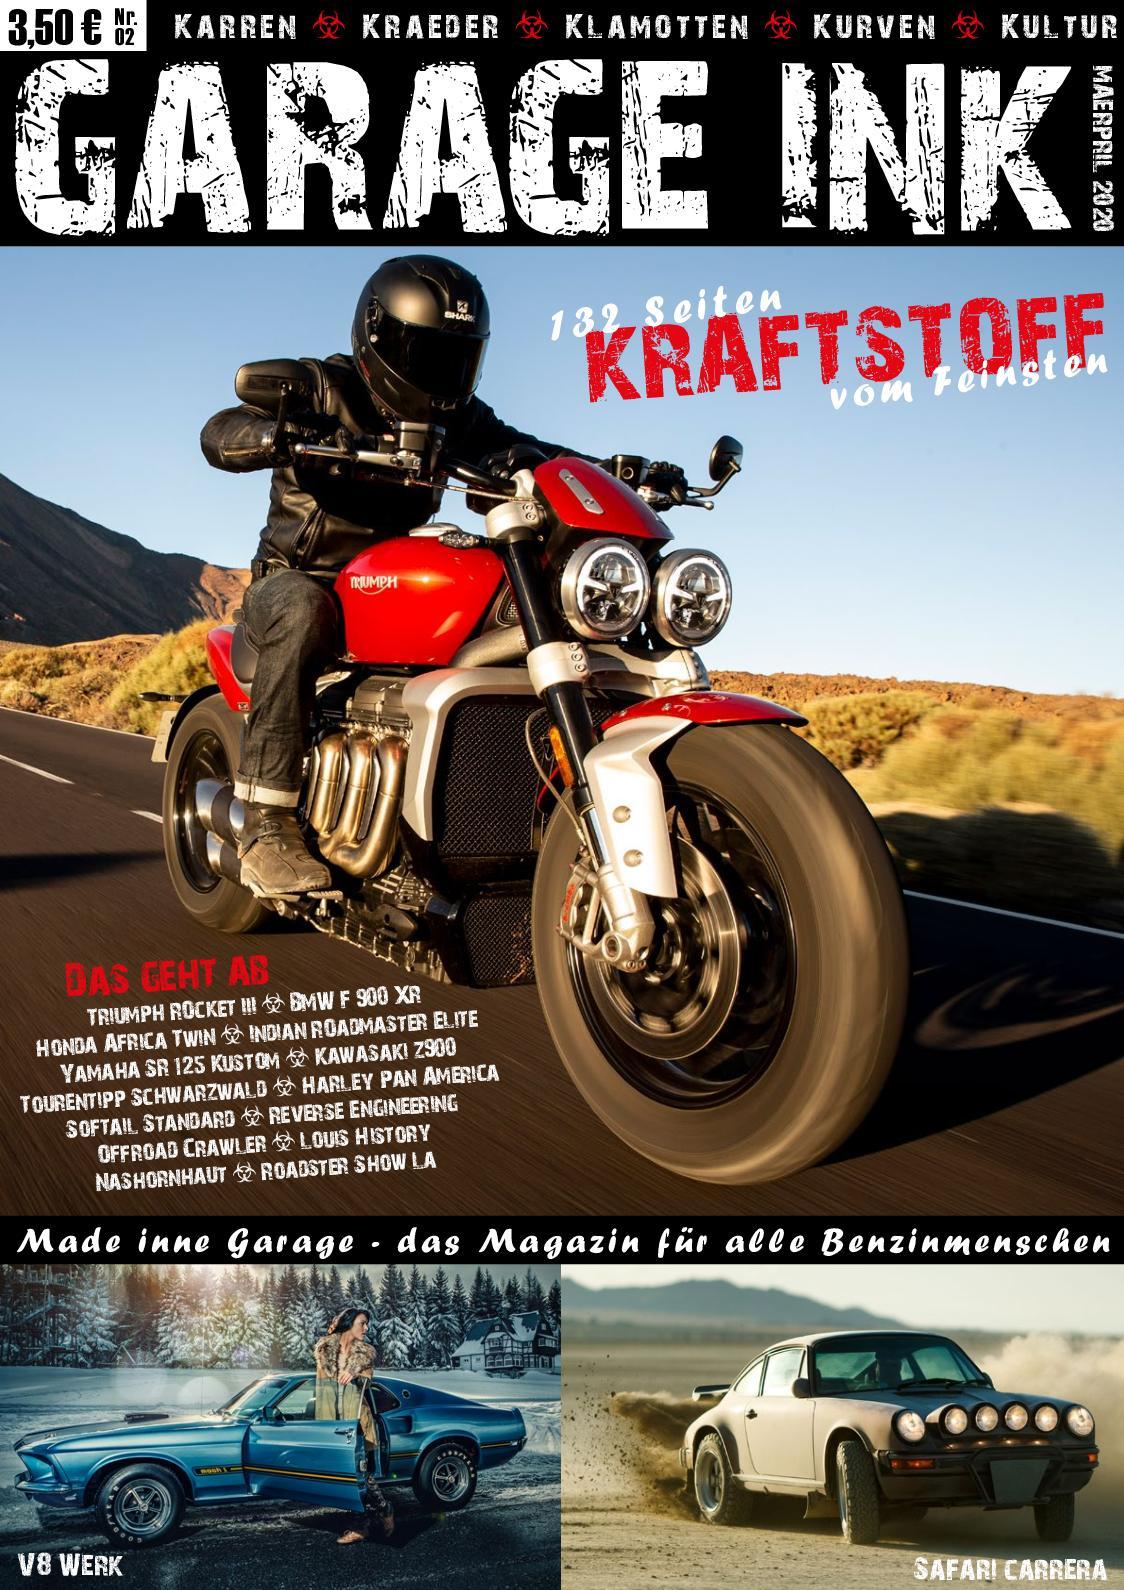 SODIAL R Motorrad Heizgriff 1 Paar 7// 8 Einstellbare Motorrad Heizgriffe Motorrad// Fahrrad Lenker Schwarz